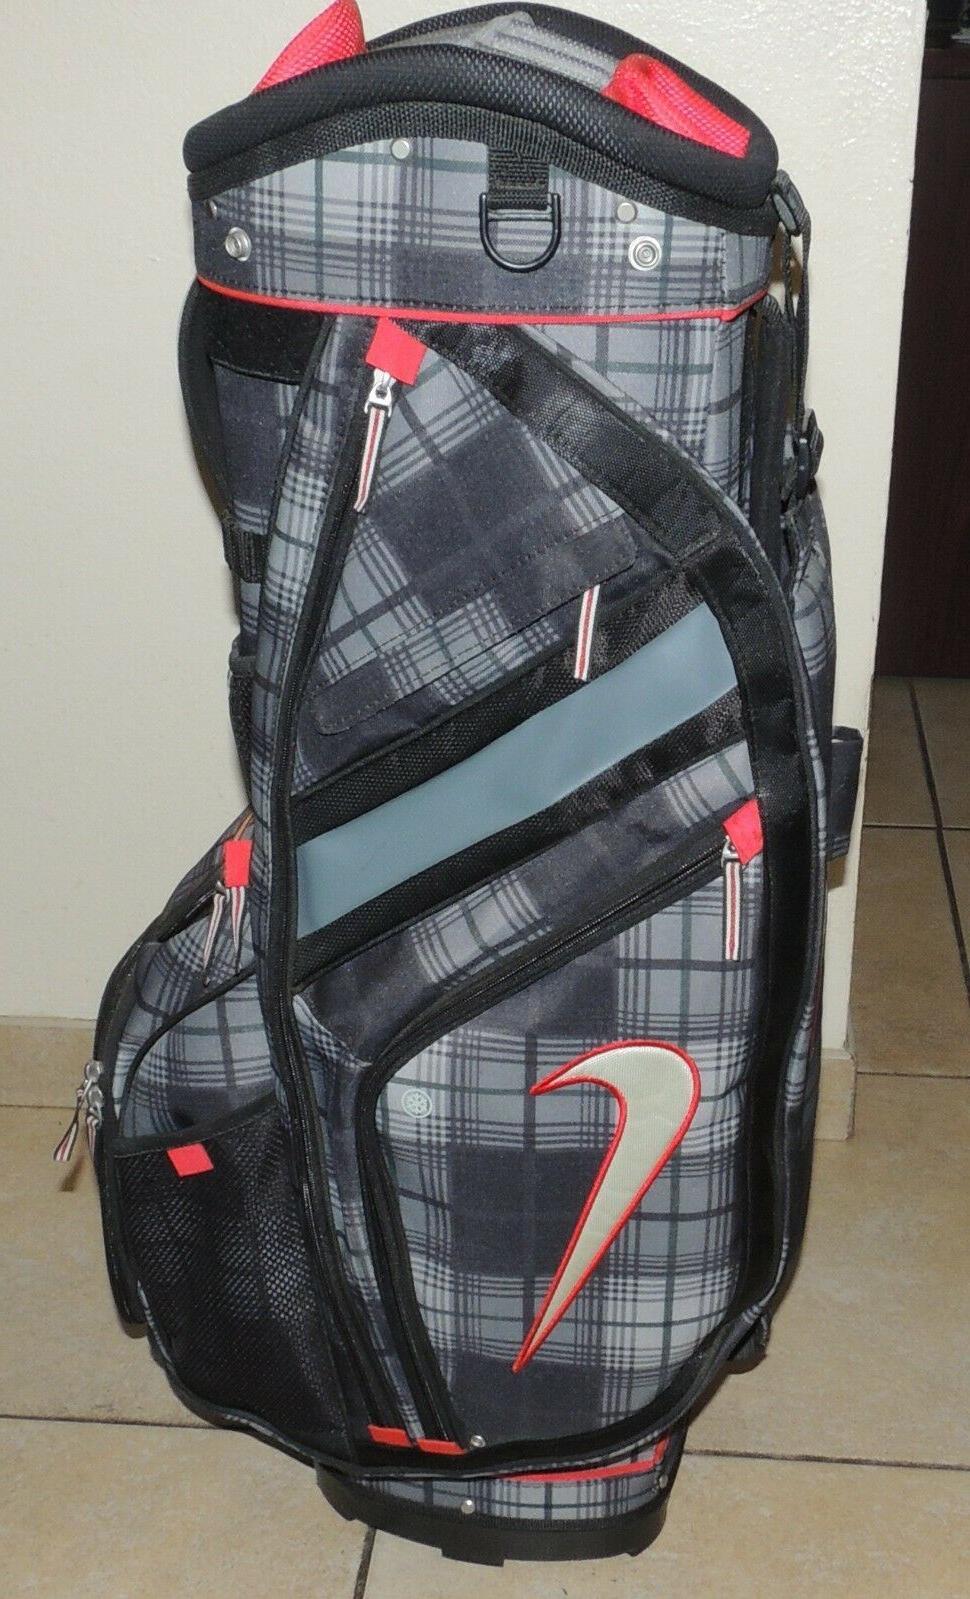 *NEW* Sport II Divider Blk/Grey/Plaid Golf